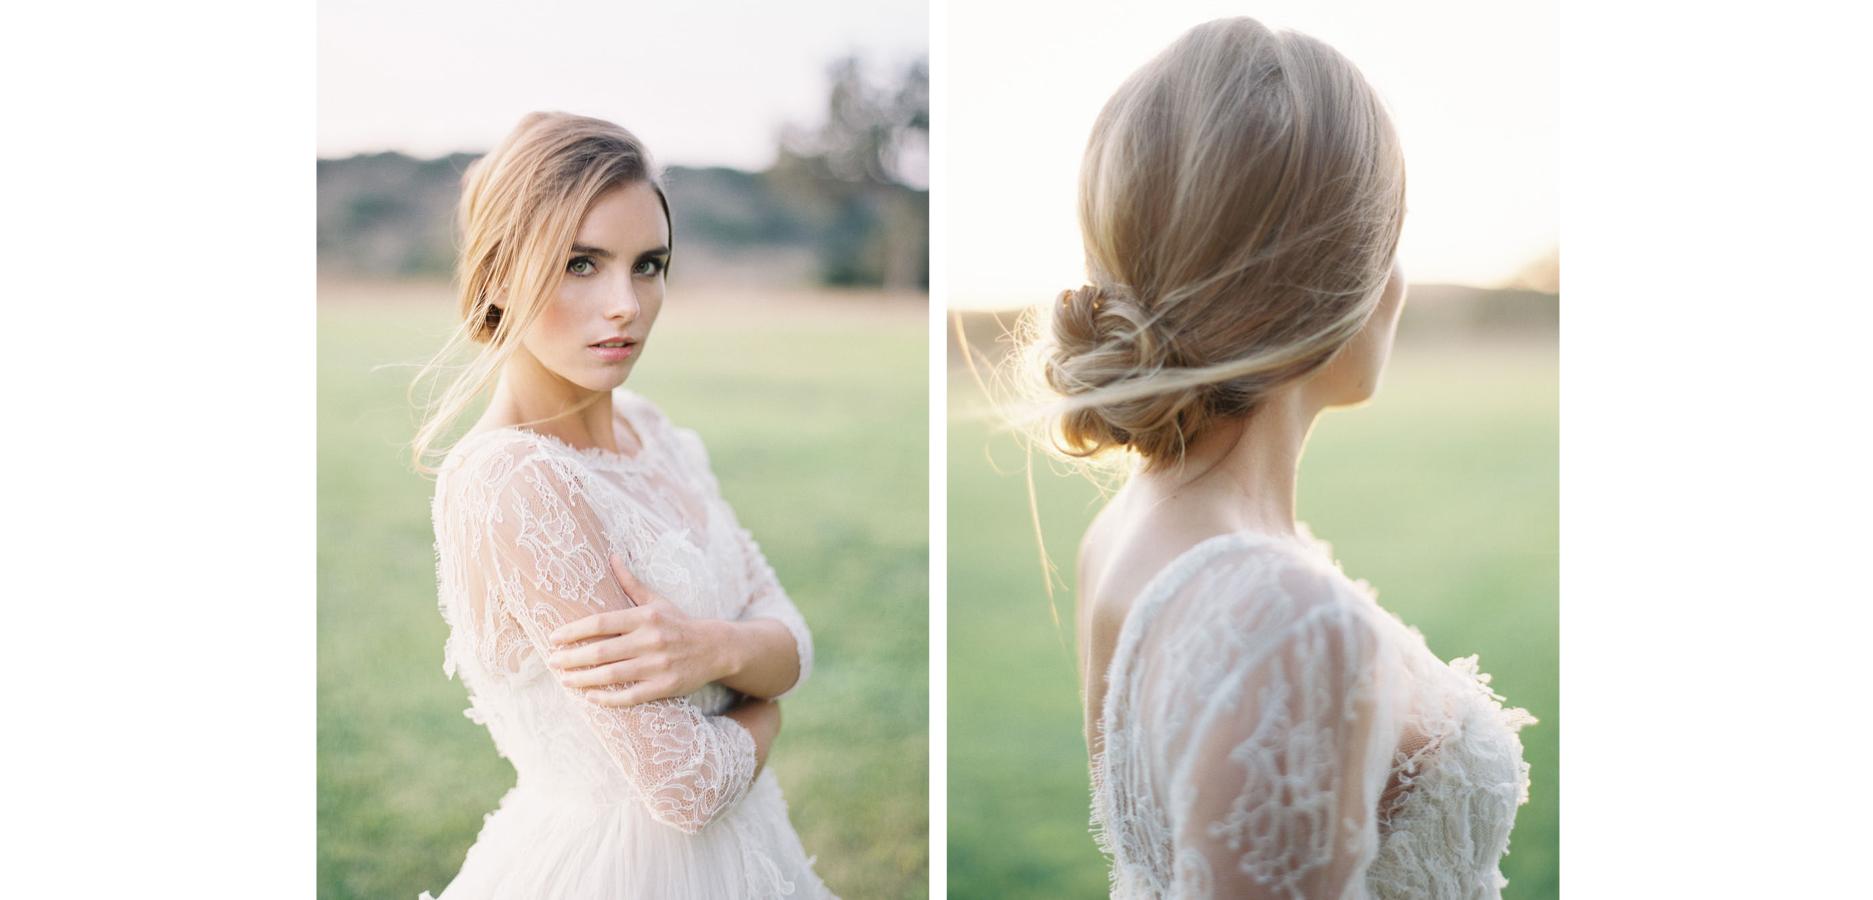 Jess-Wilcox-Hair-Makeup-Wedding_portfolio11.jpg